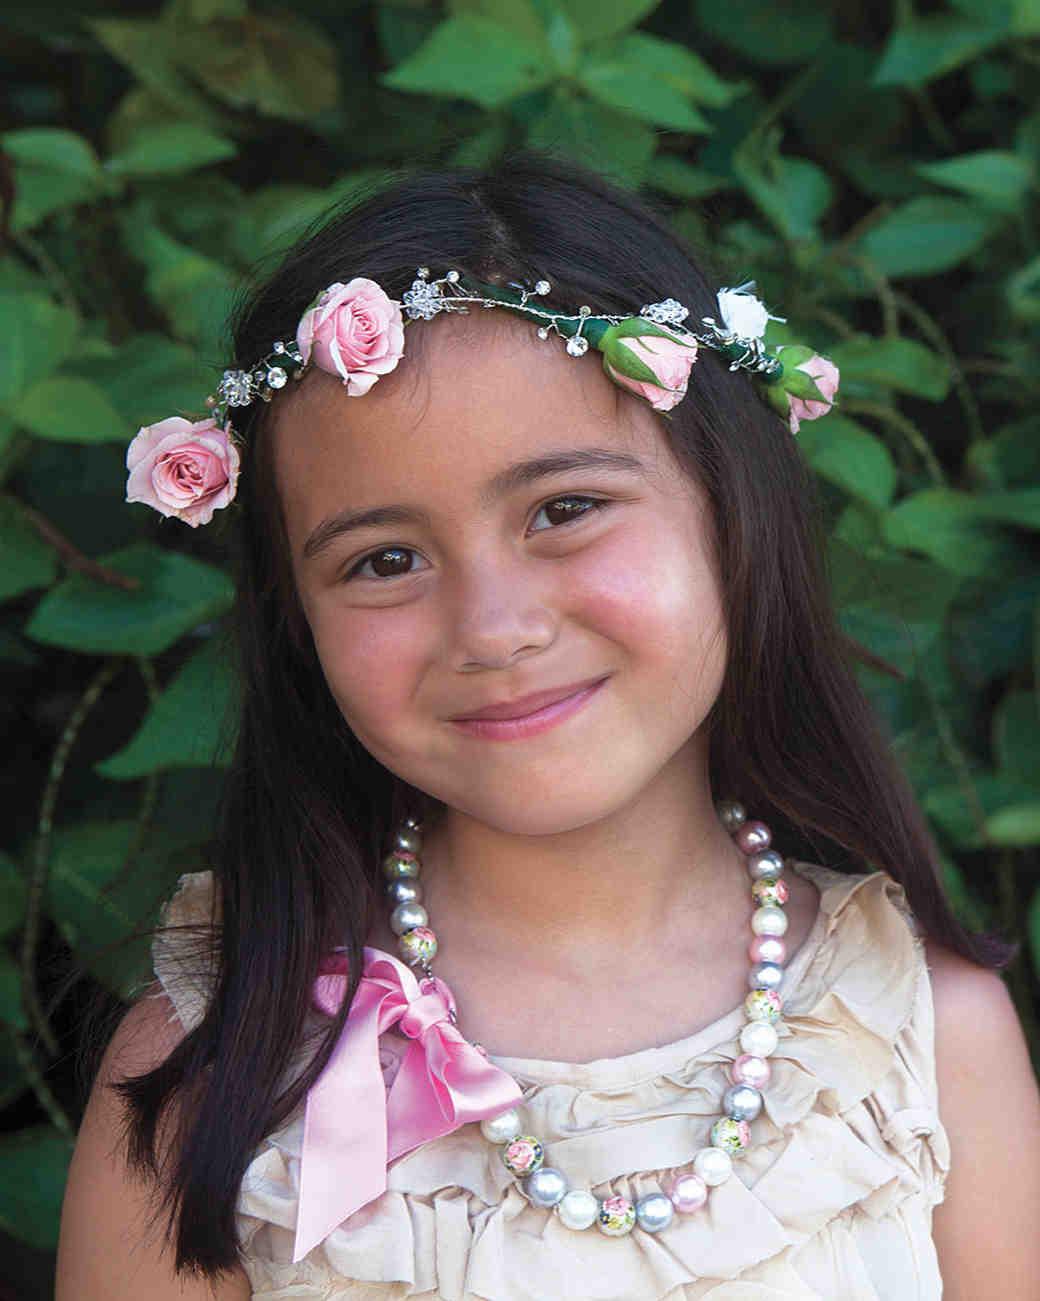 rw-anne-josh-flowergirl-mwd106057.jpg